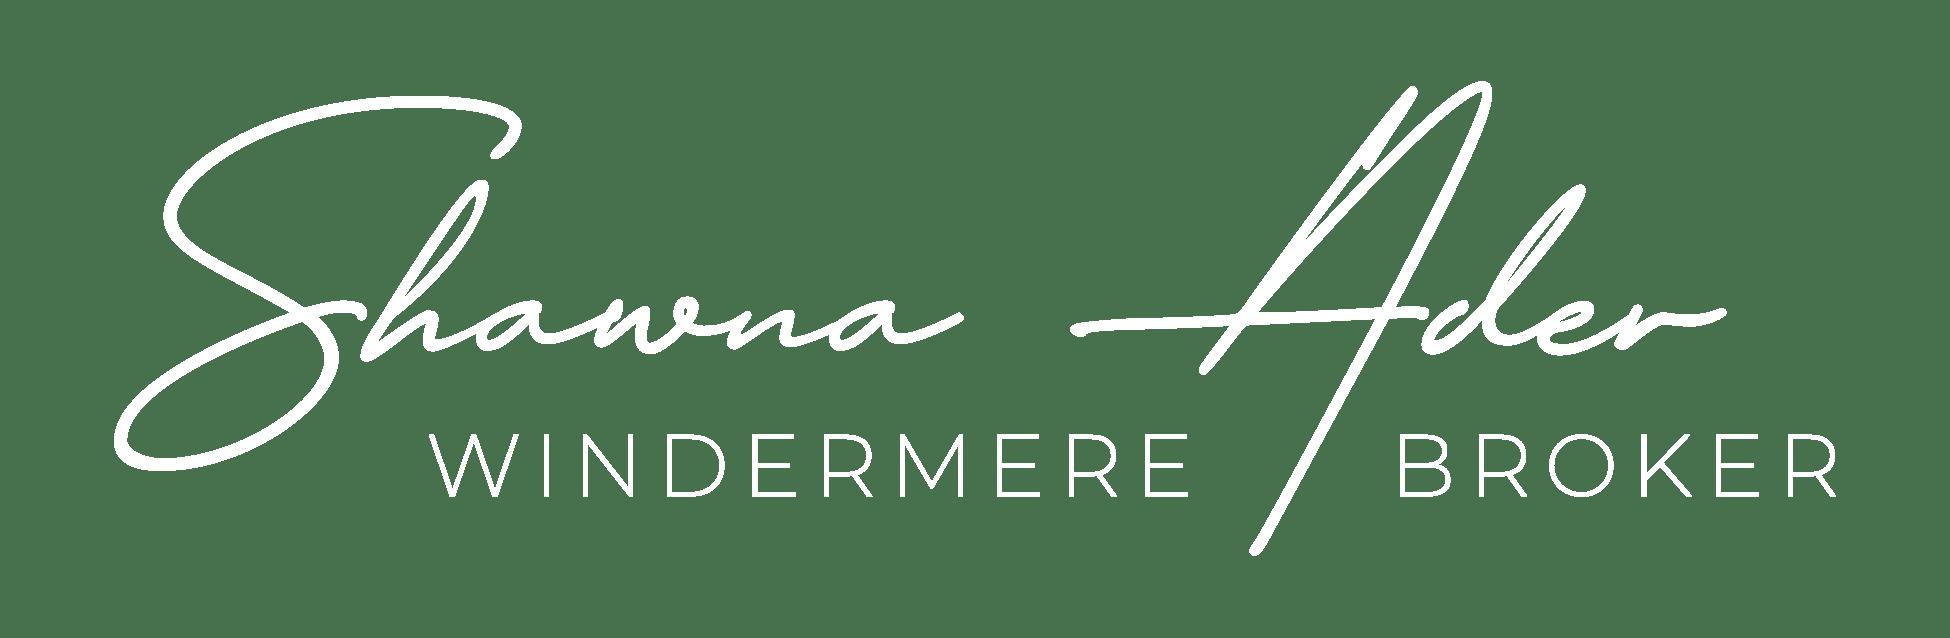 Shawna Adar logo